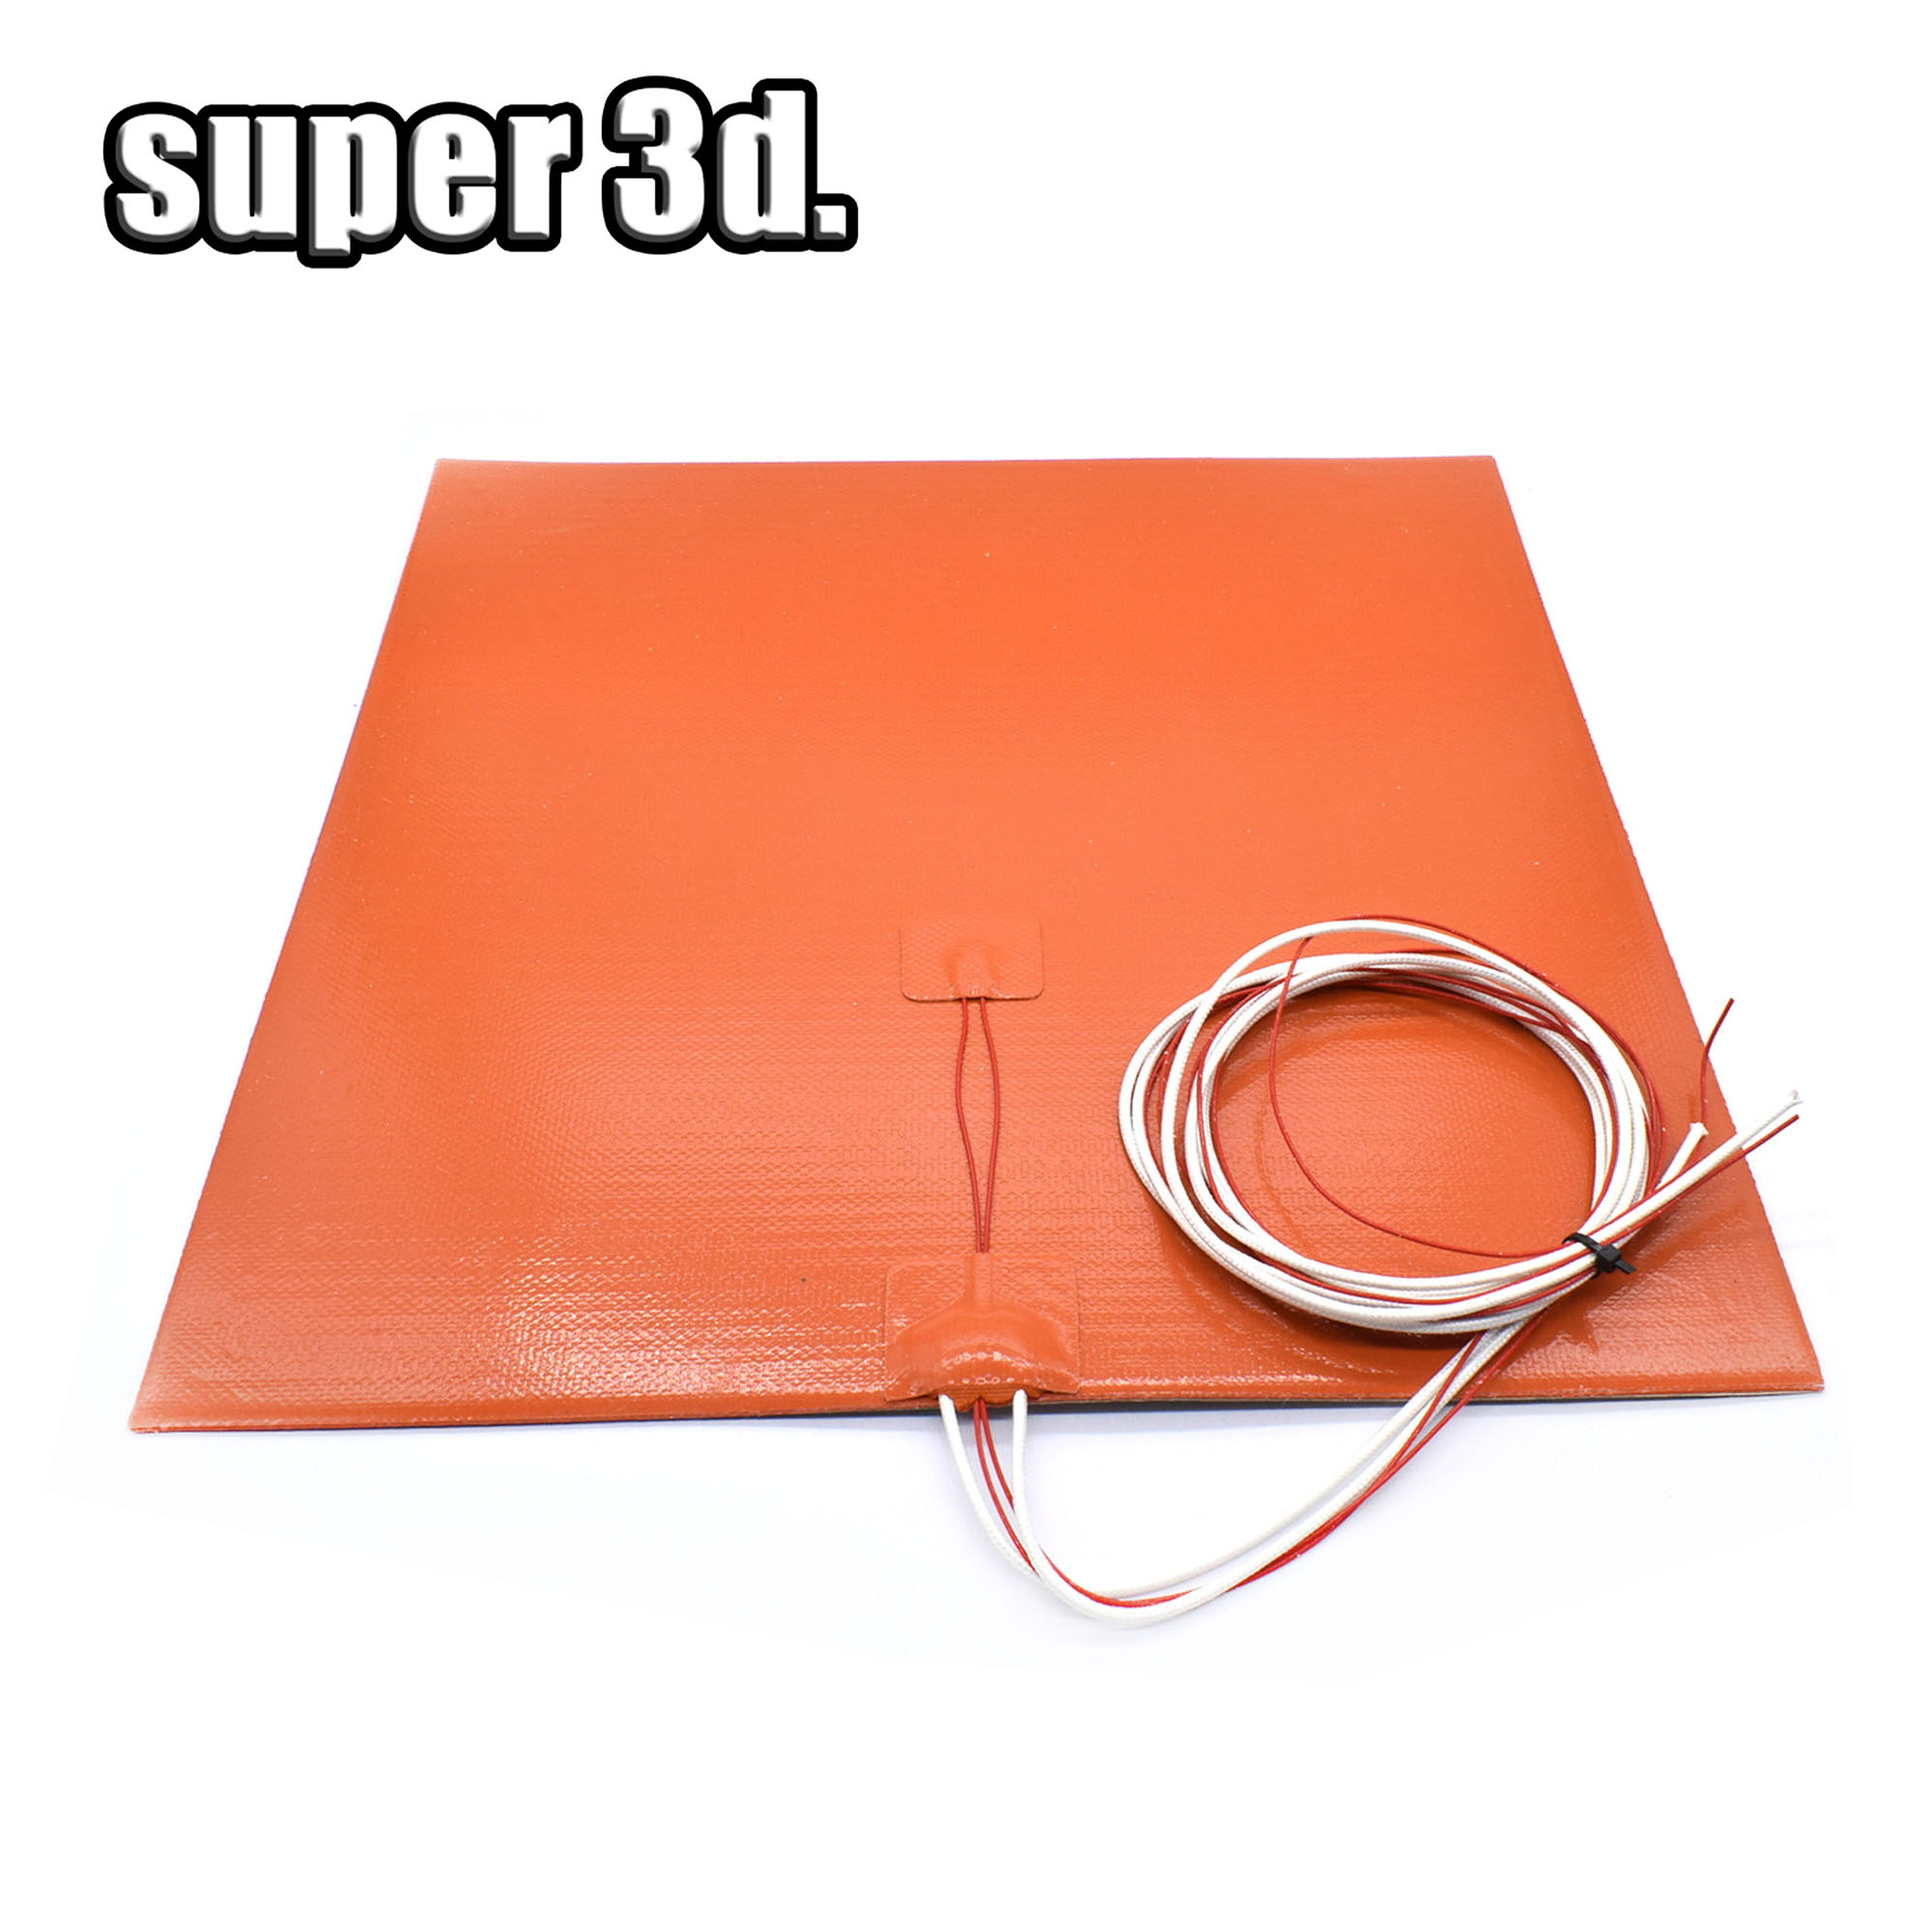 almofada aquecida de silicone almofada de aquecimento a prova d agua para cama 220 310 235